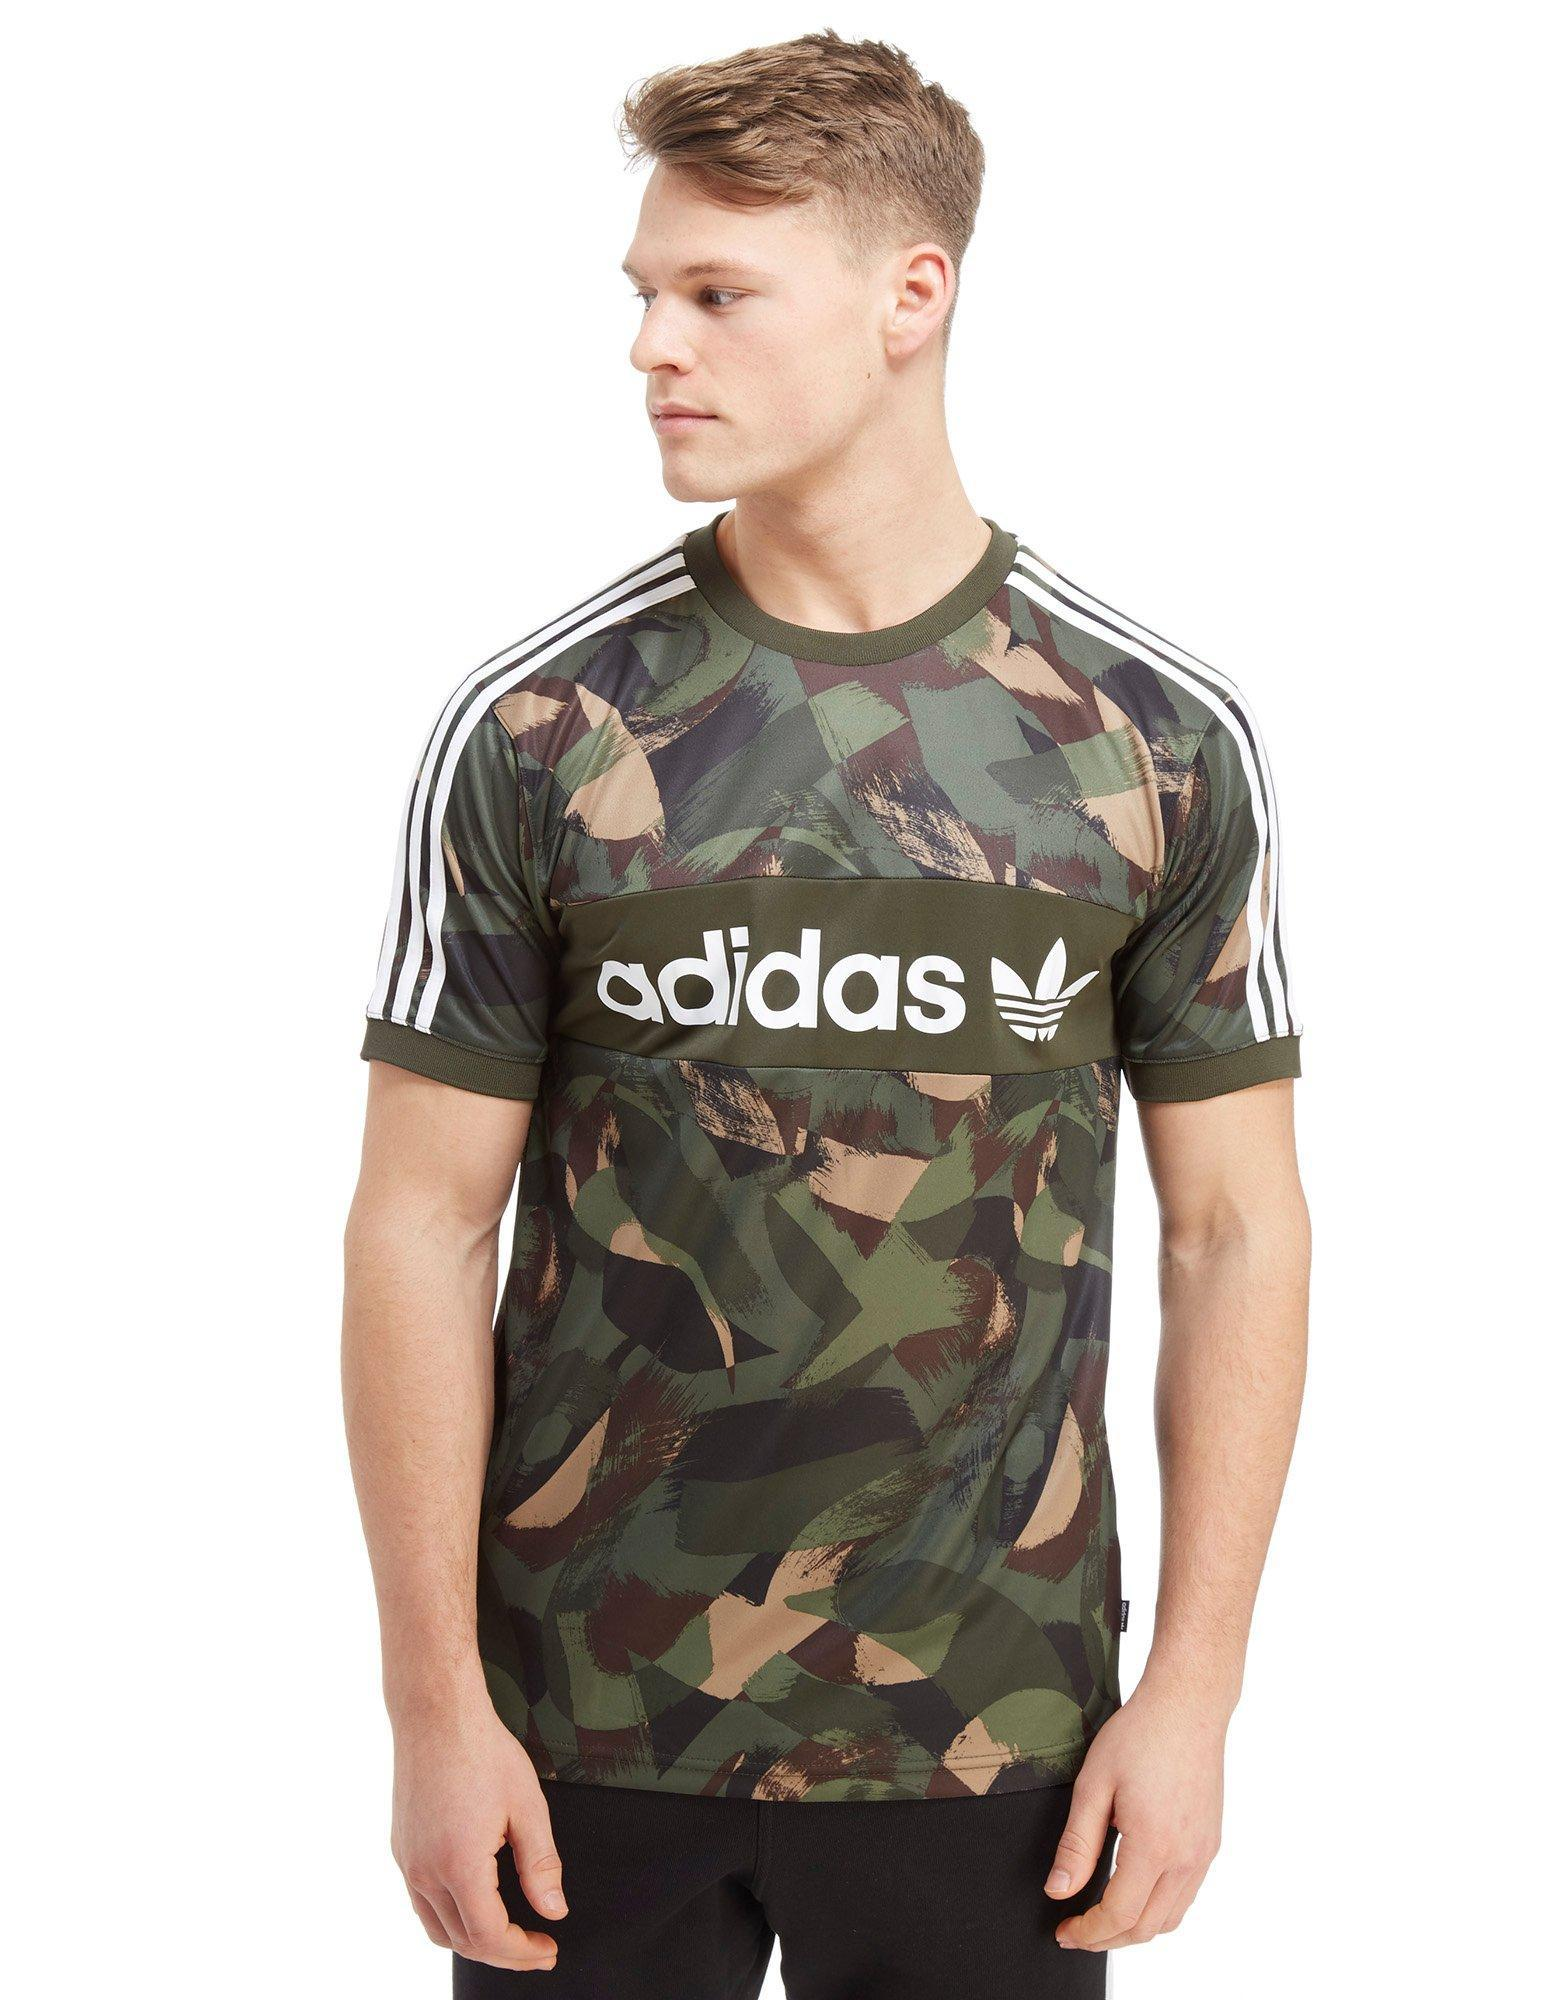 Lyst adidas Originals skateboarding Camo lineal poly t shirt en